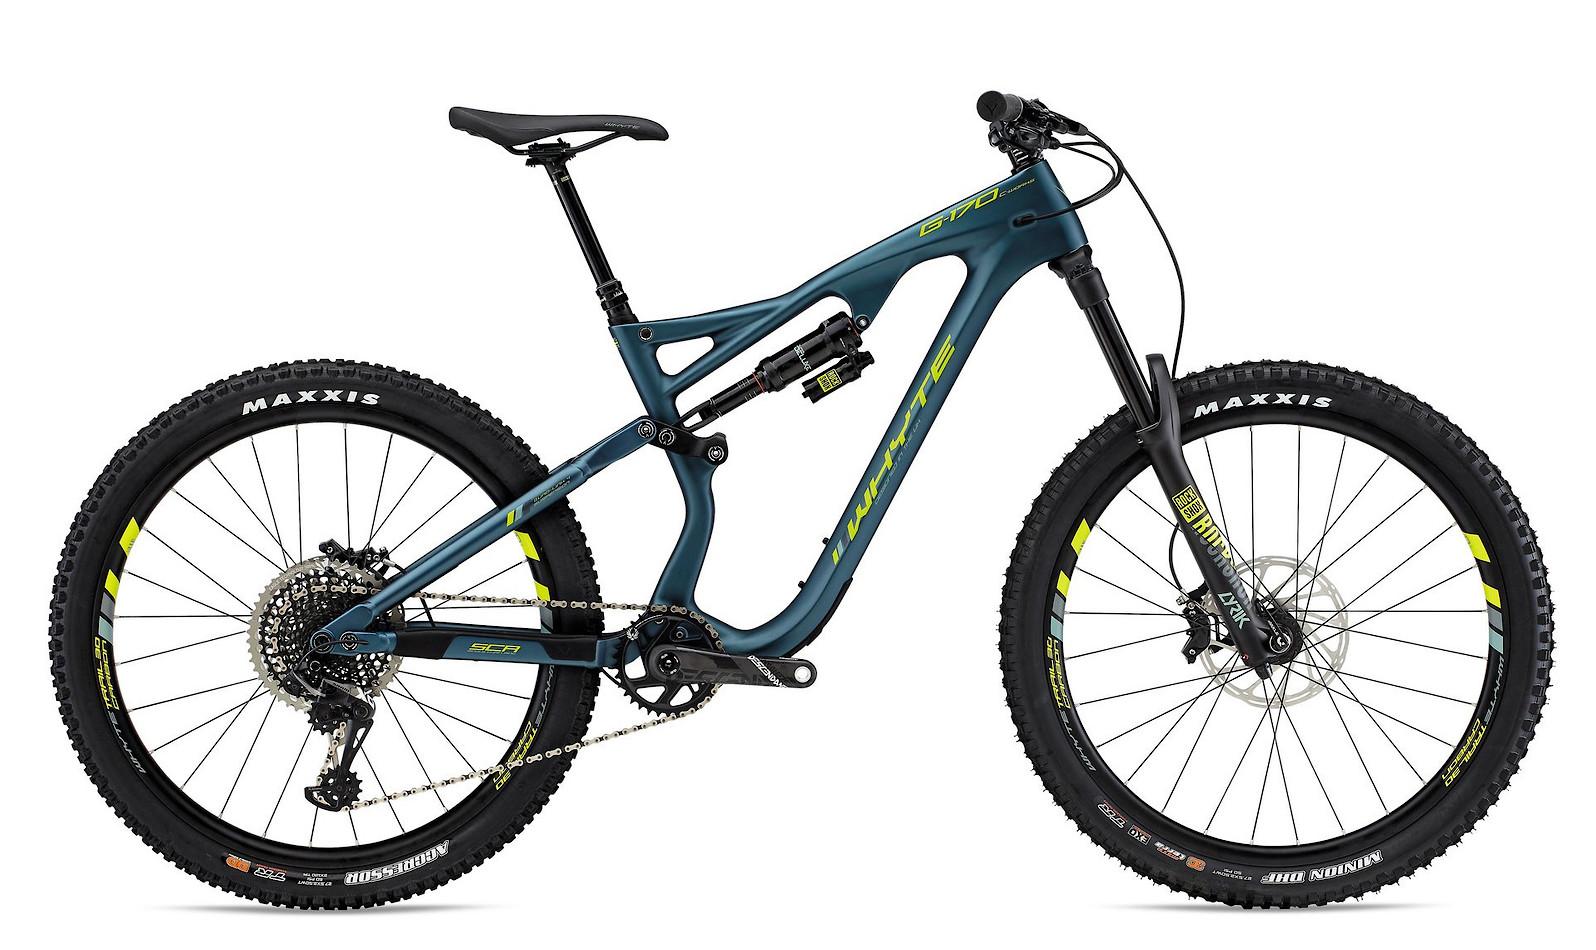 2019 Whyte G-170C Works Bike